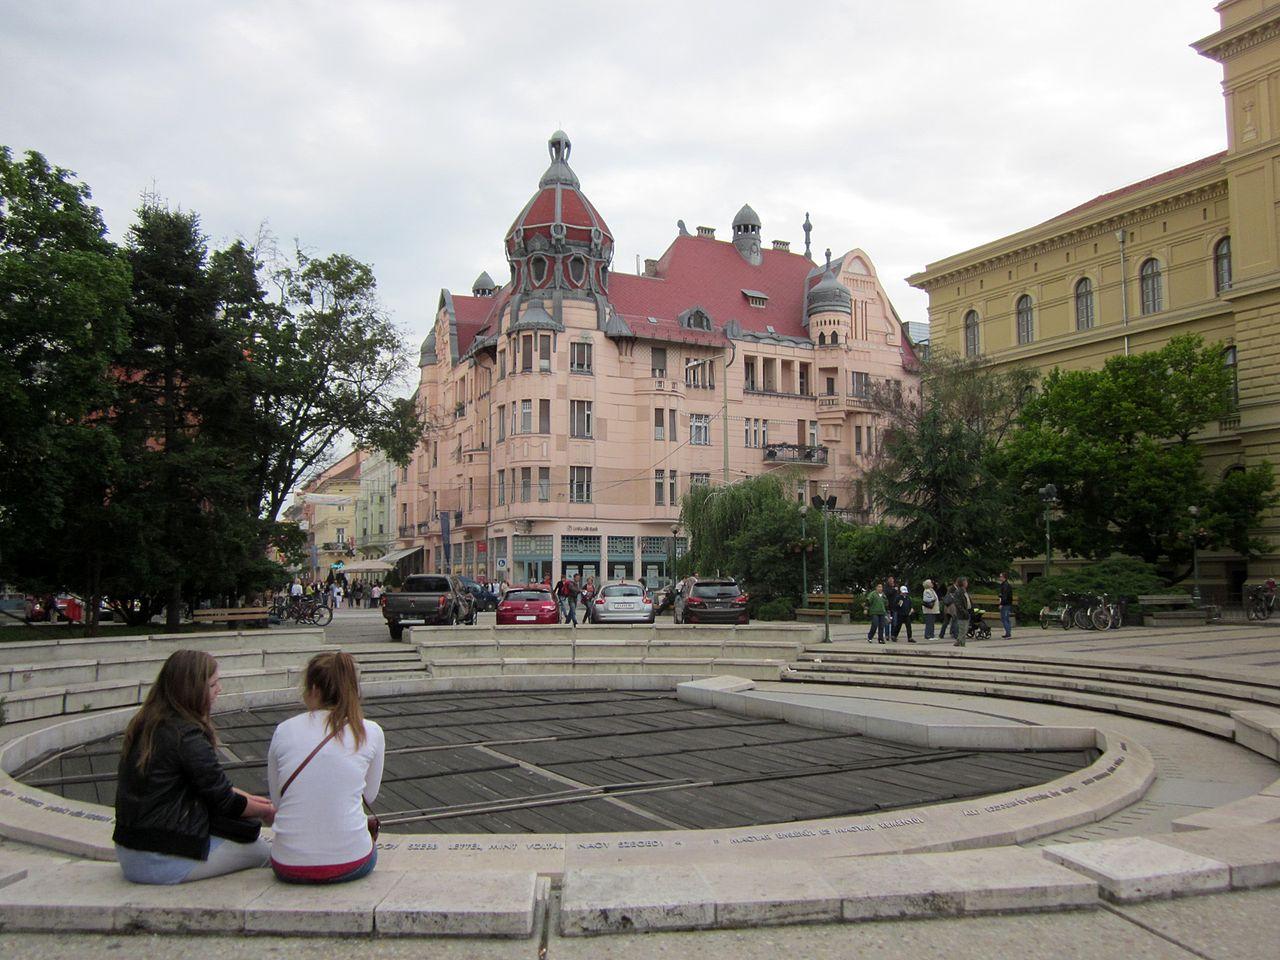 File:Unger-Mayer House, Szeged, Hungary - panoramio.jpg ...